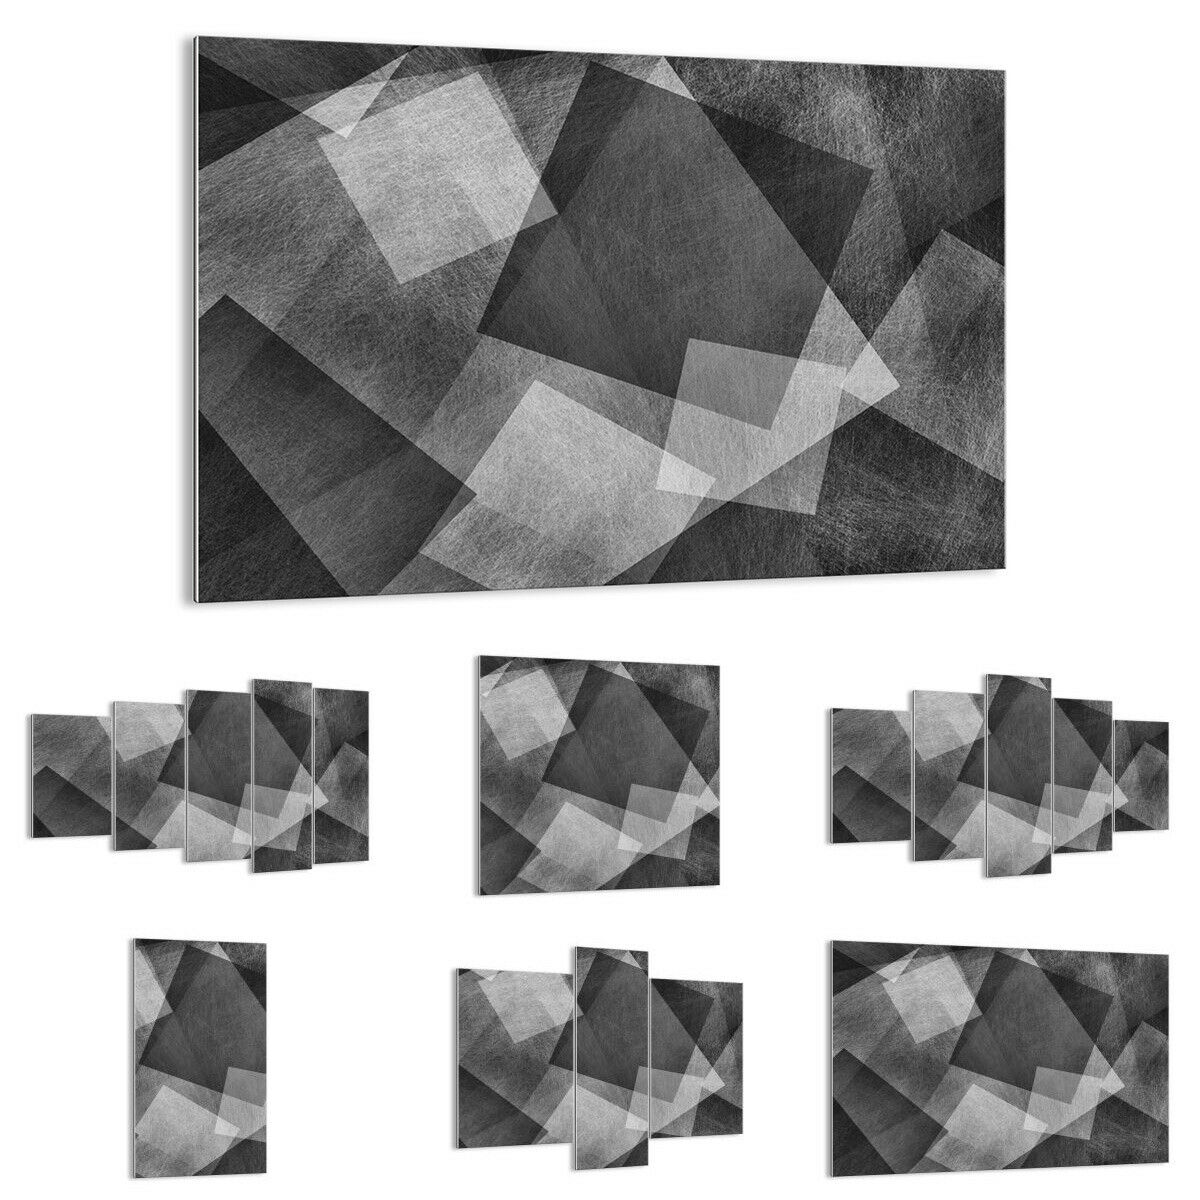 GLASS PRINTS Image Wall Art abstraction modern 3996 UK